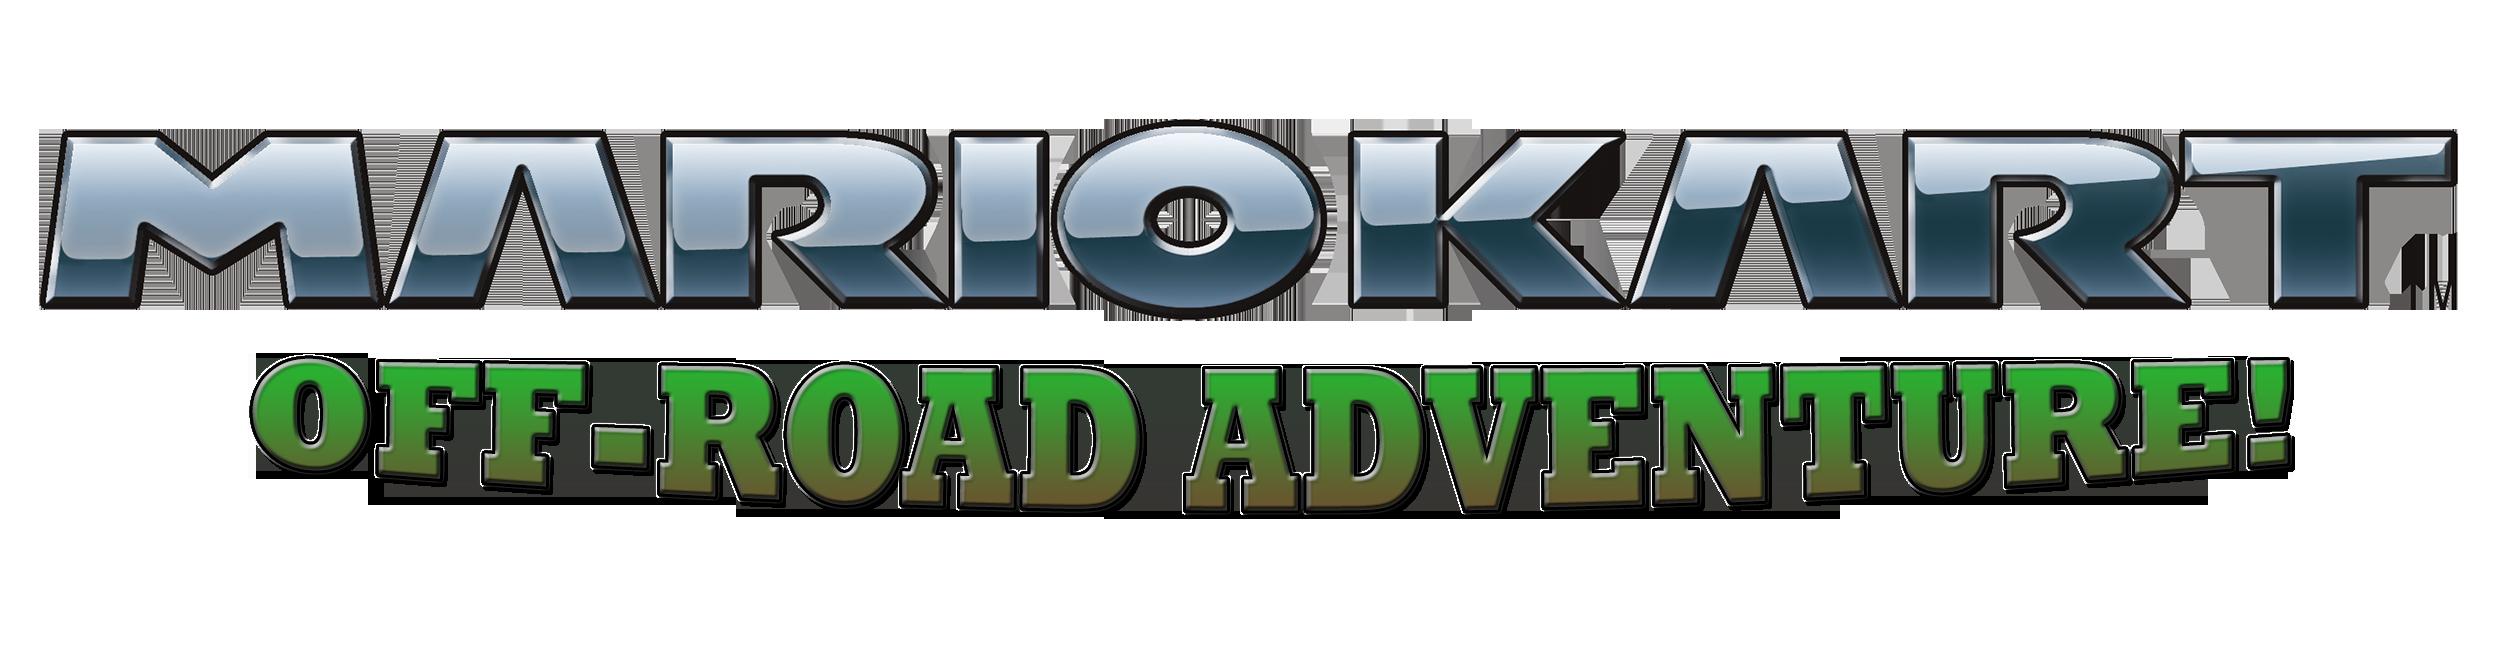 Mario Kart: Off Road Adventure!